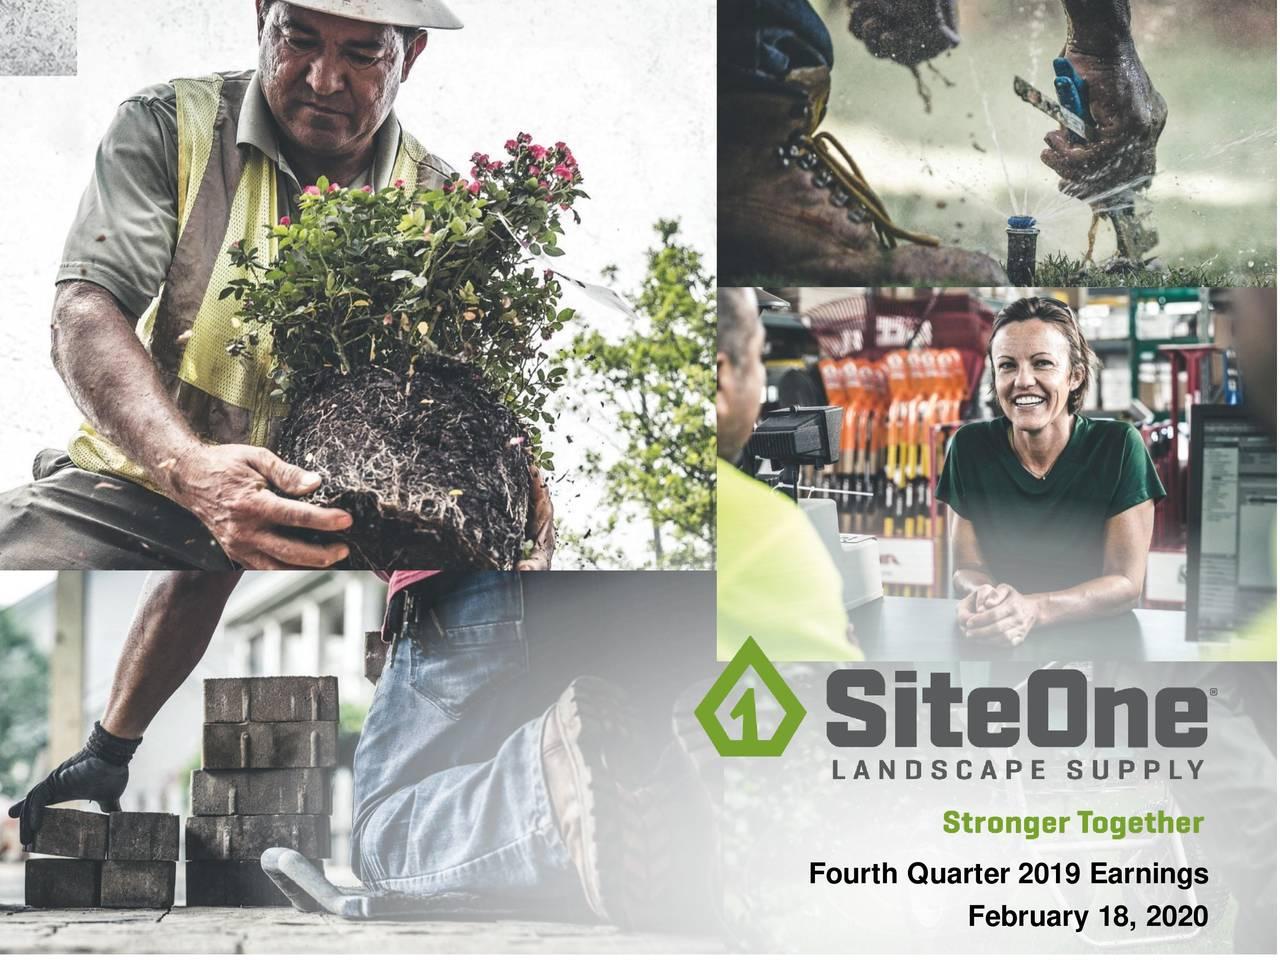 SiteOne Landscape Supply, Inc. 2019 Q4 - Results - Earnings Call Presentation - SiteOne Landscape Supply, Inc. (NYSE:SITE) | Seeking Alpha